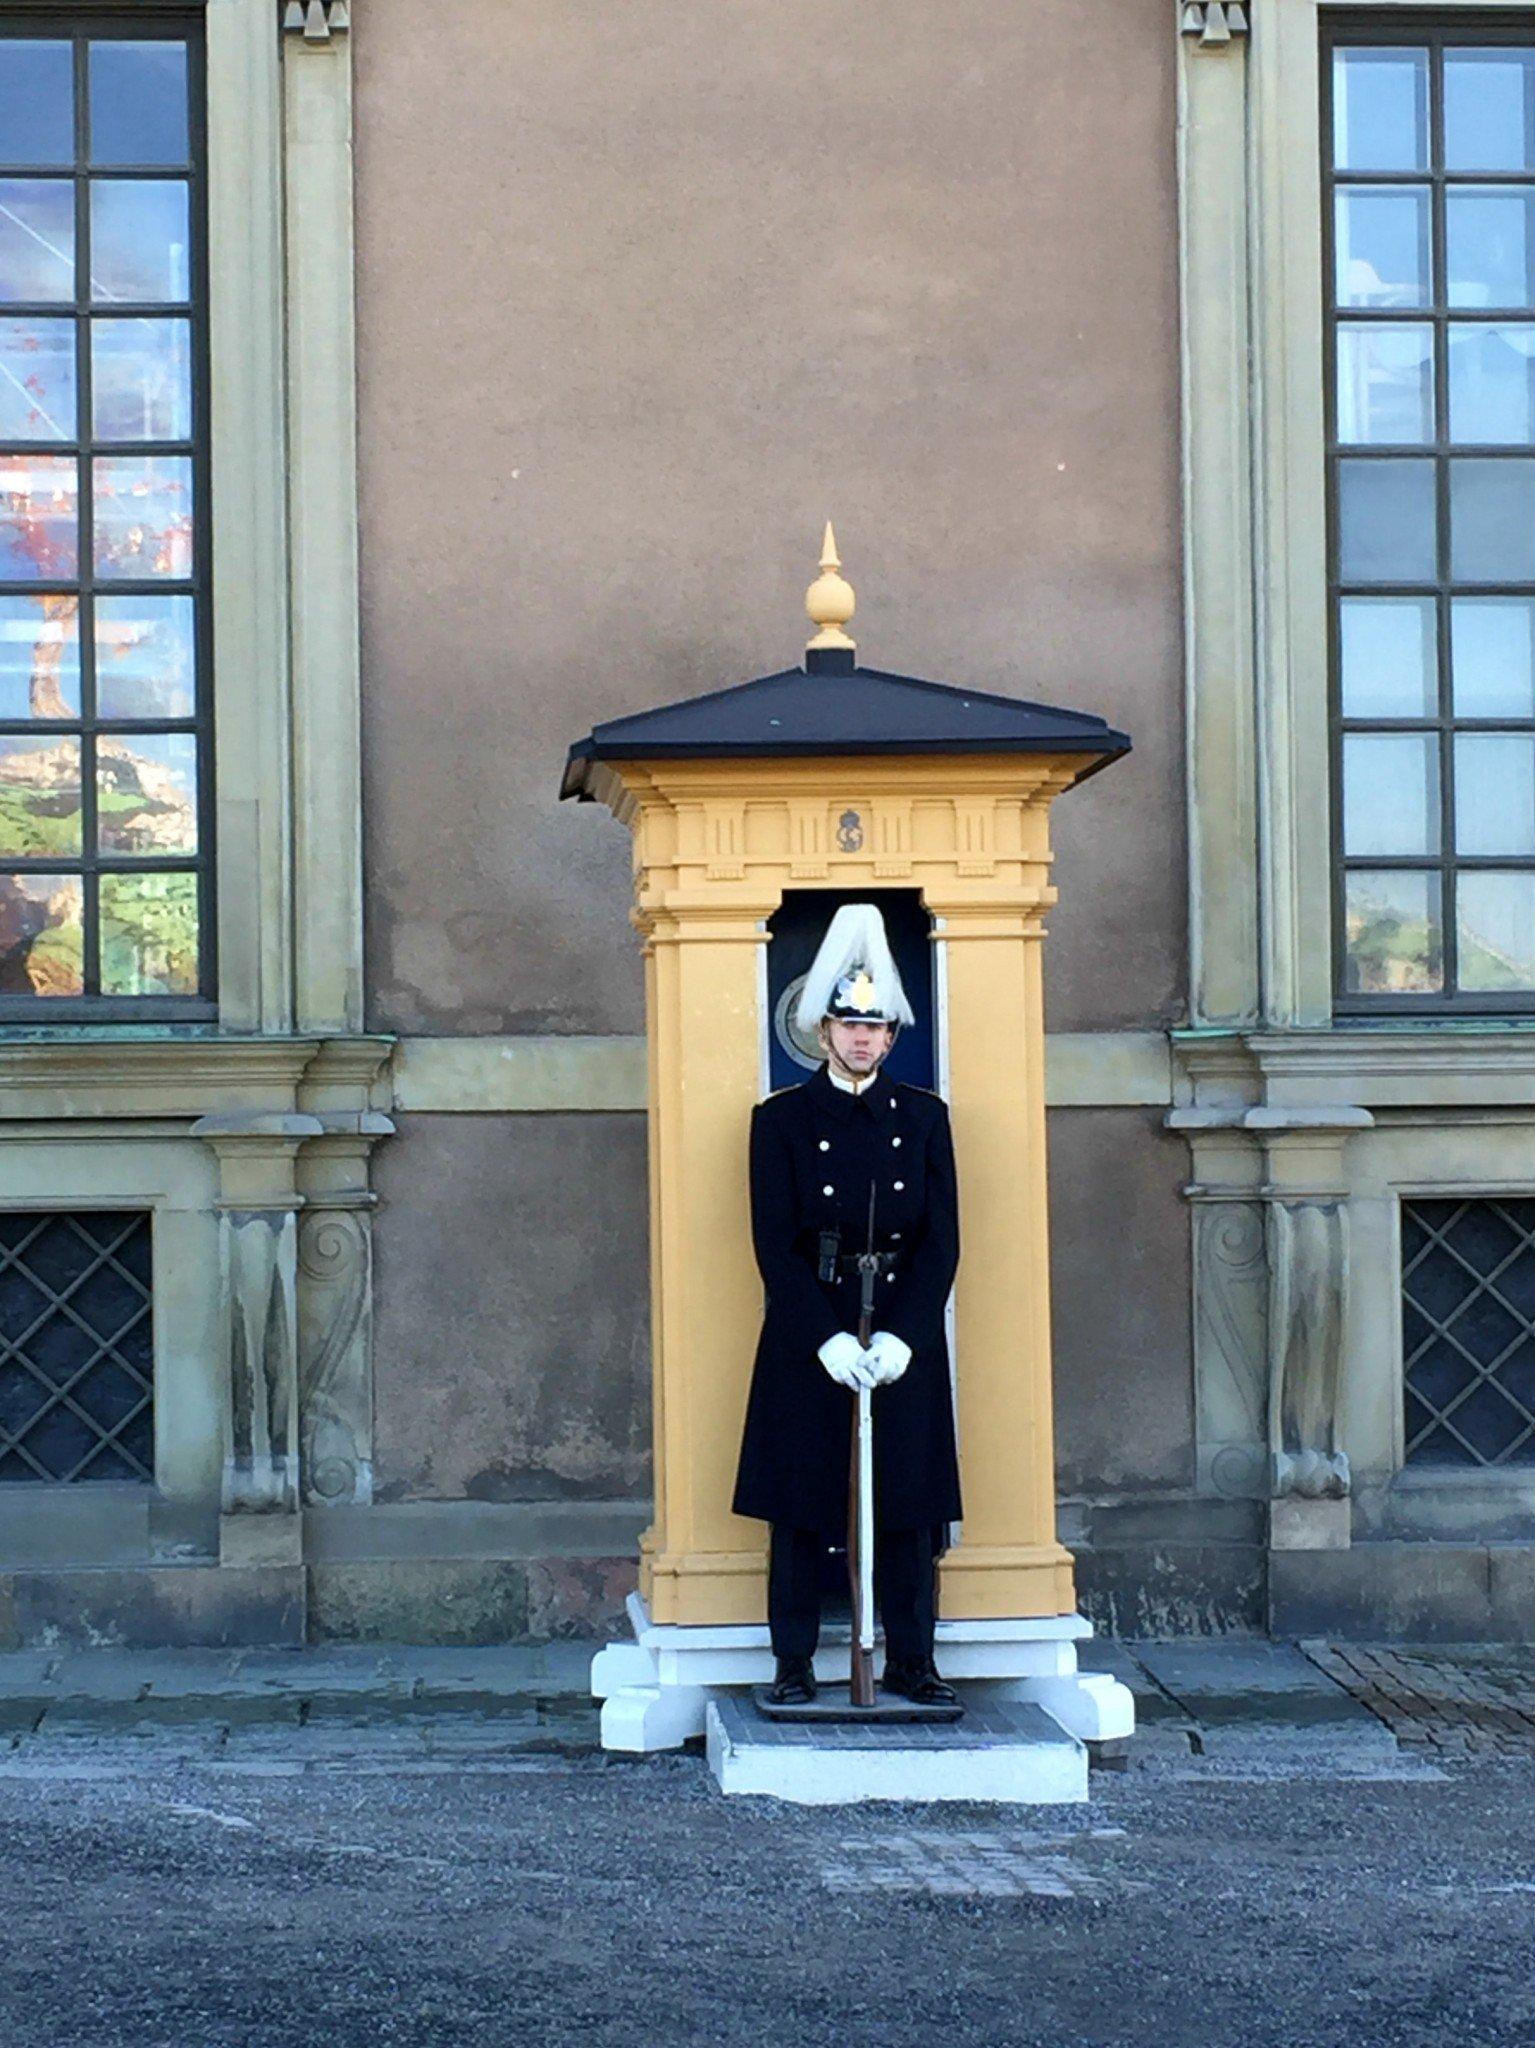 Tukholma vartija